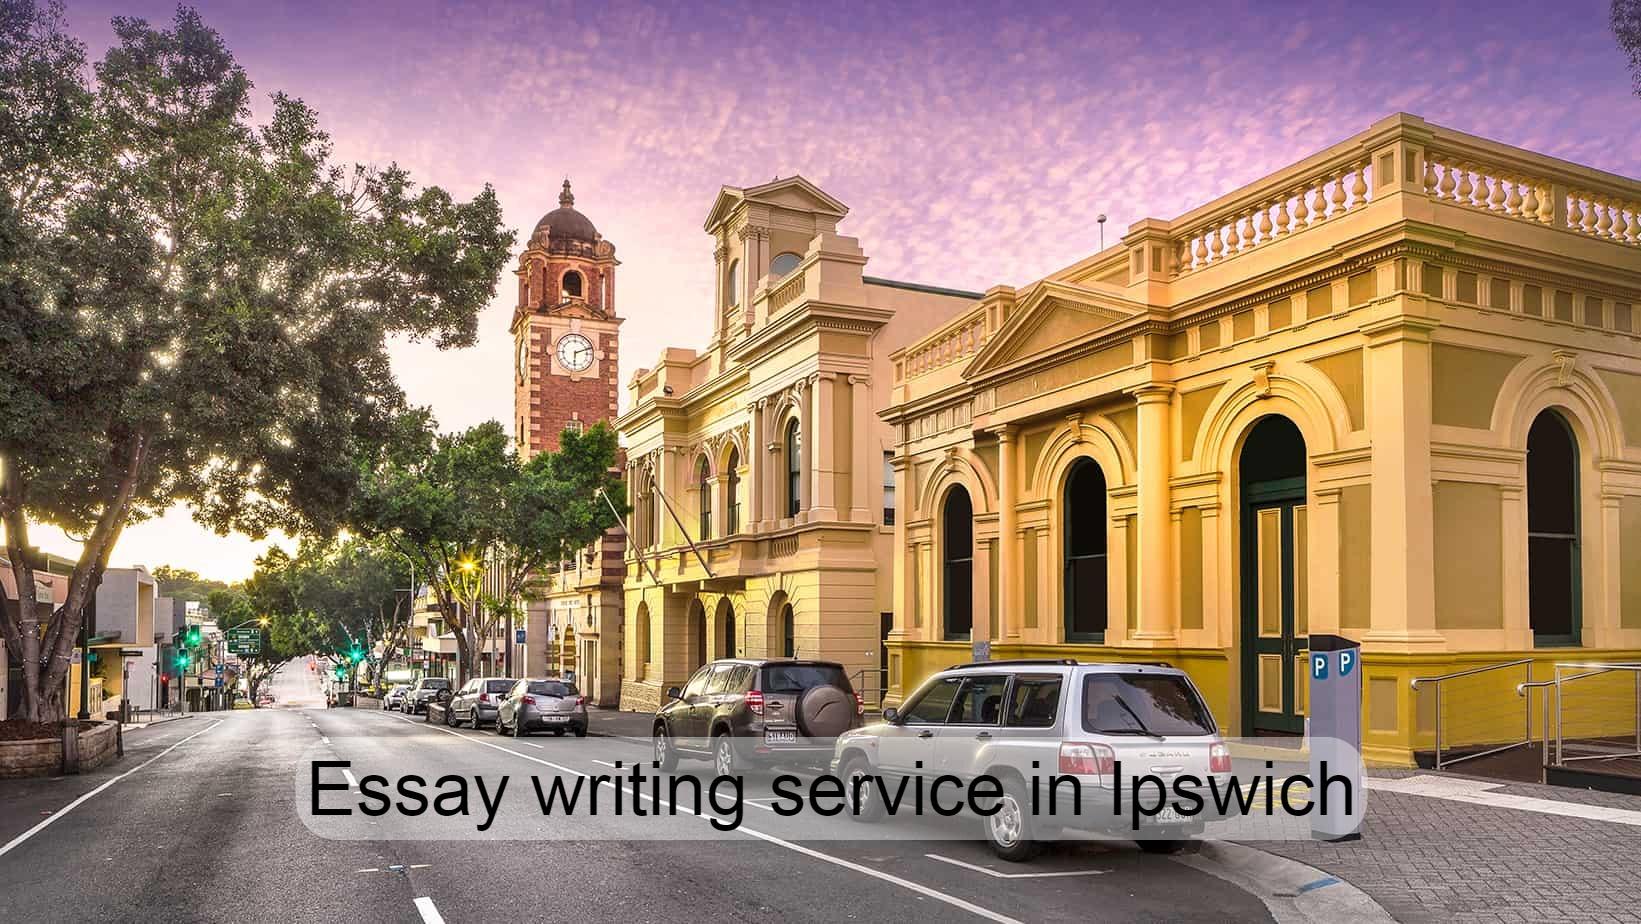 Essay writing service in Ipswich